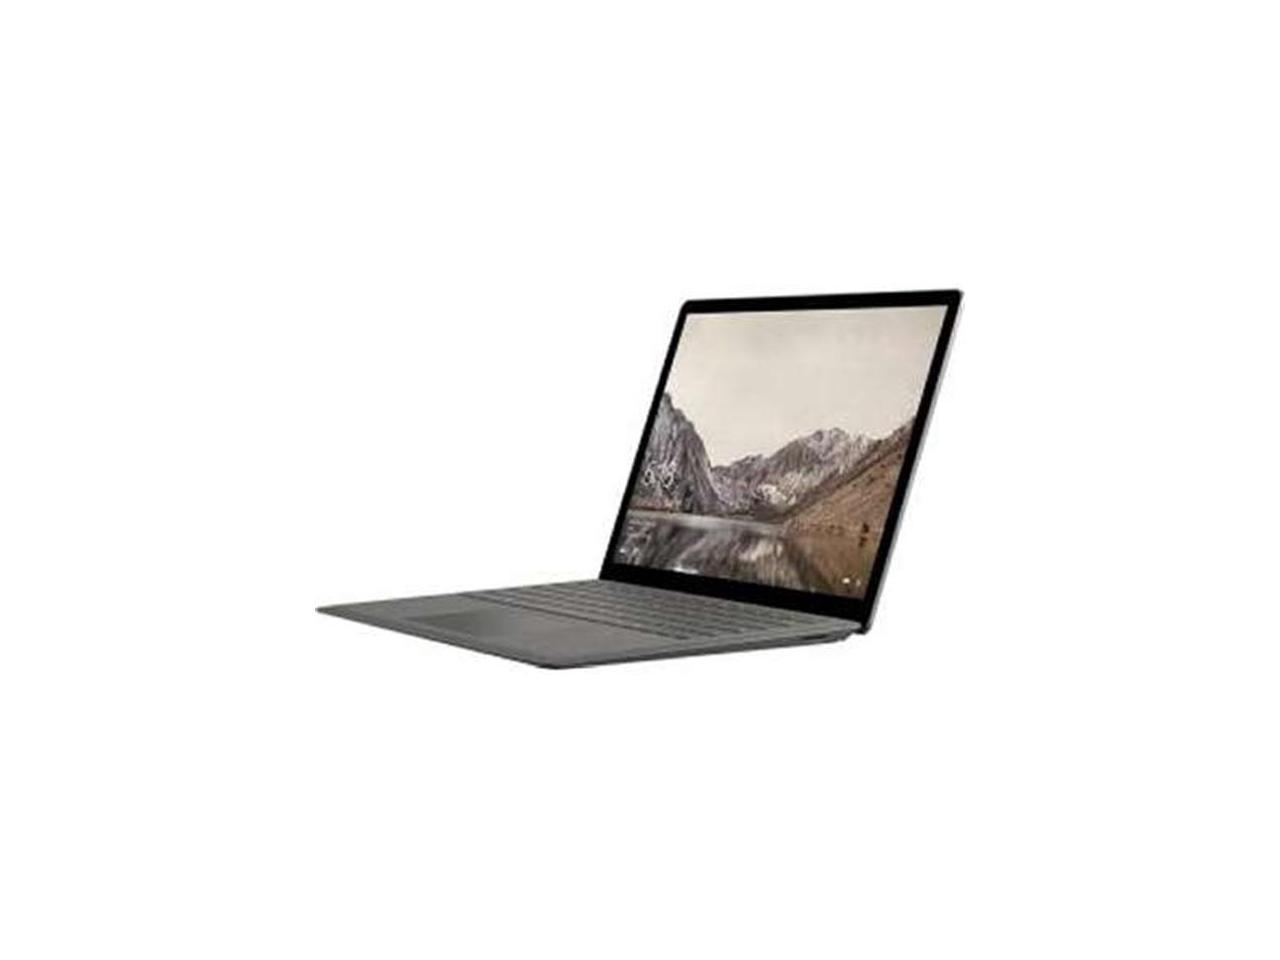 Microsoft surface laptop, i7 7th Gen 7660U, 13.5, 8gb, 256ssd $699.99